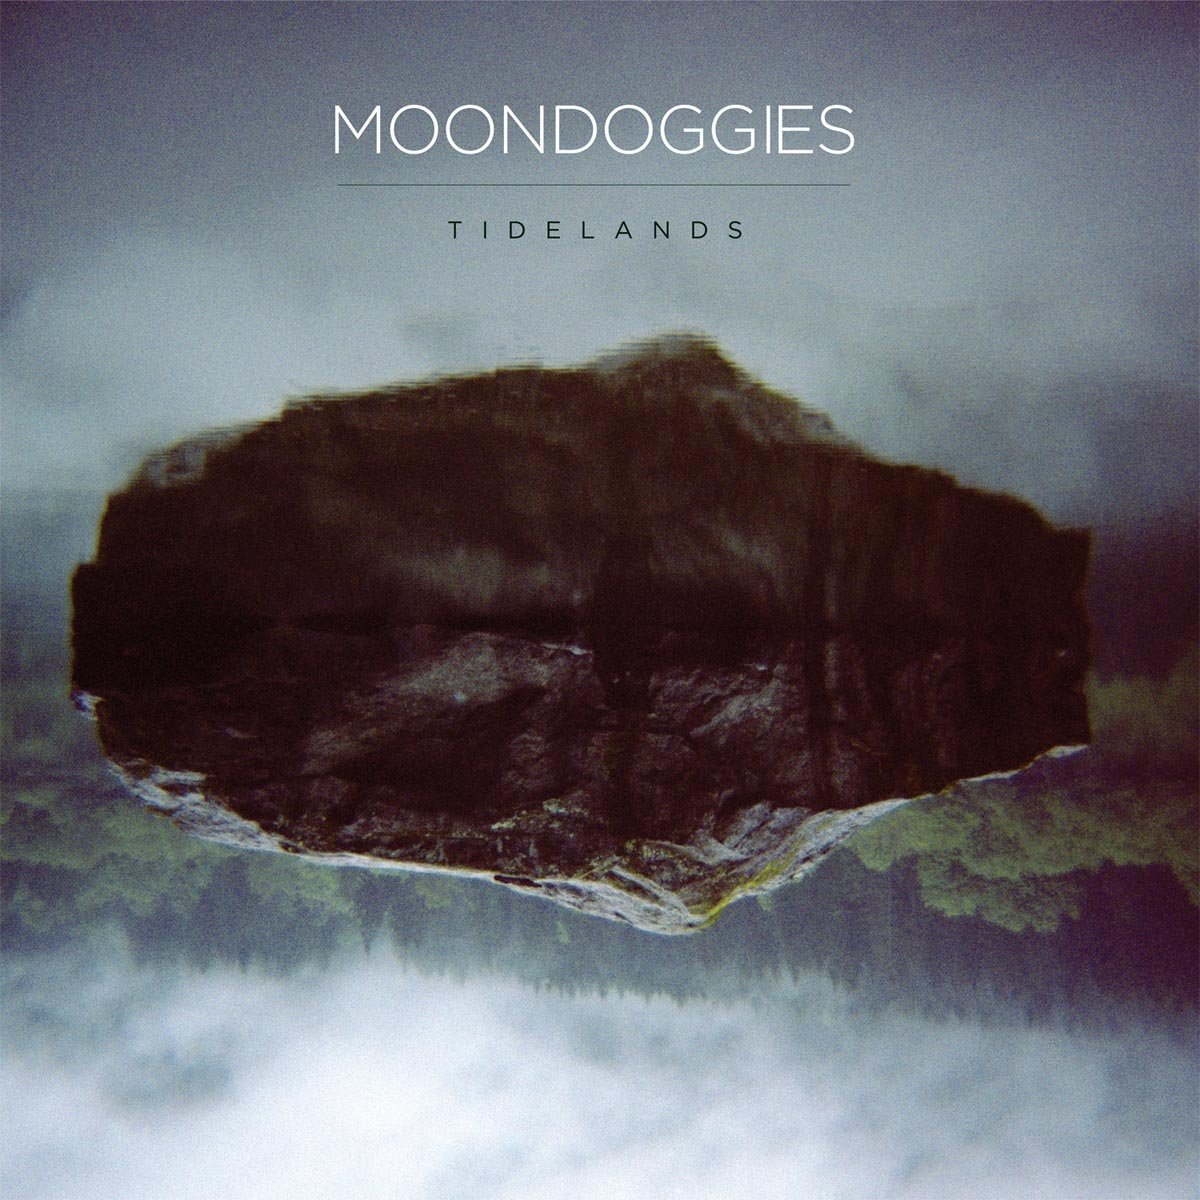 MOONDOGGIES - TIDELANDS